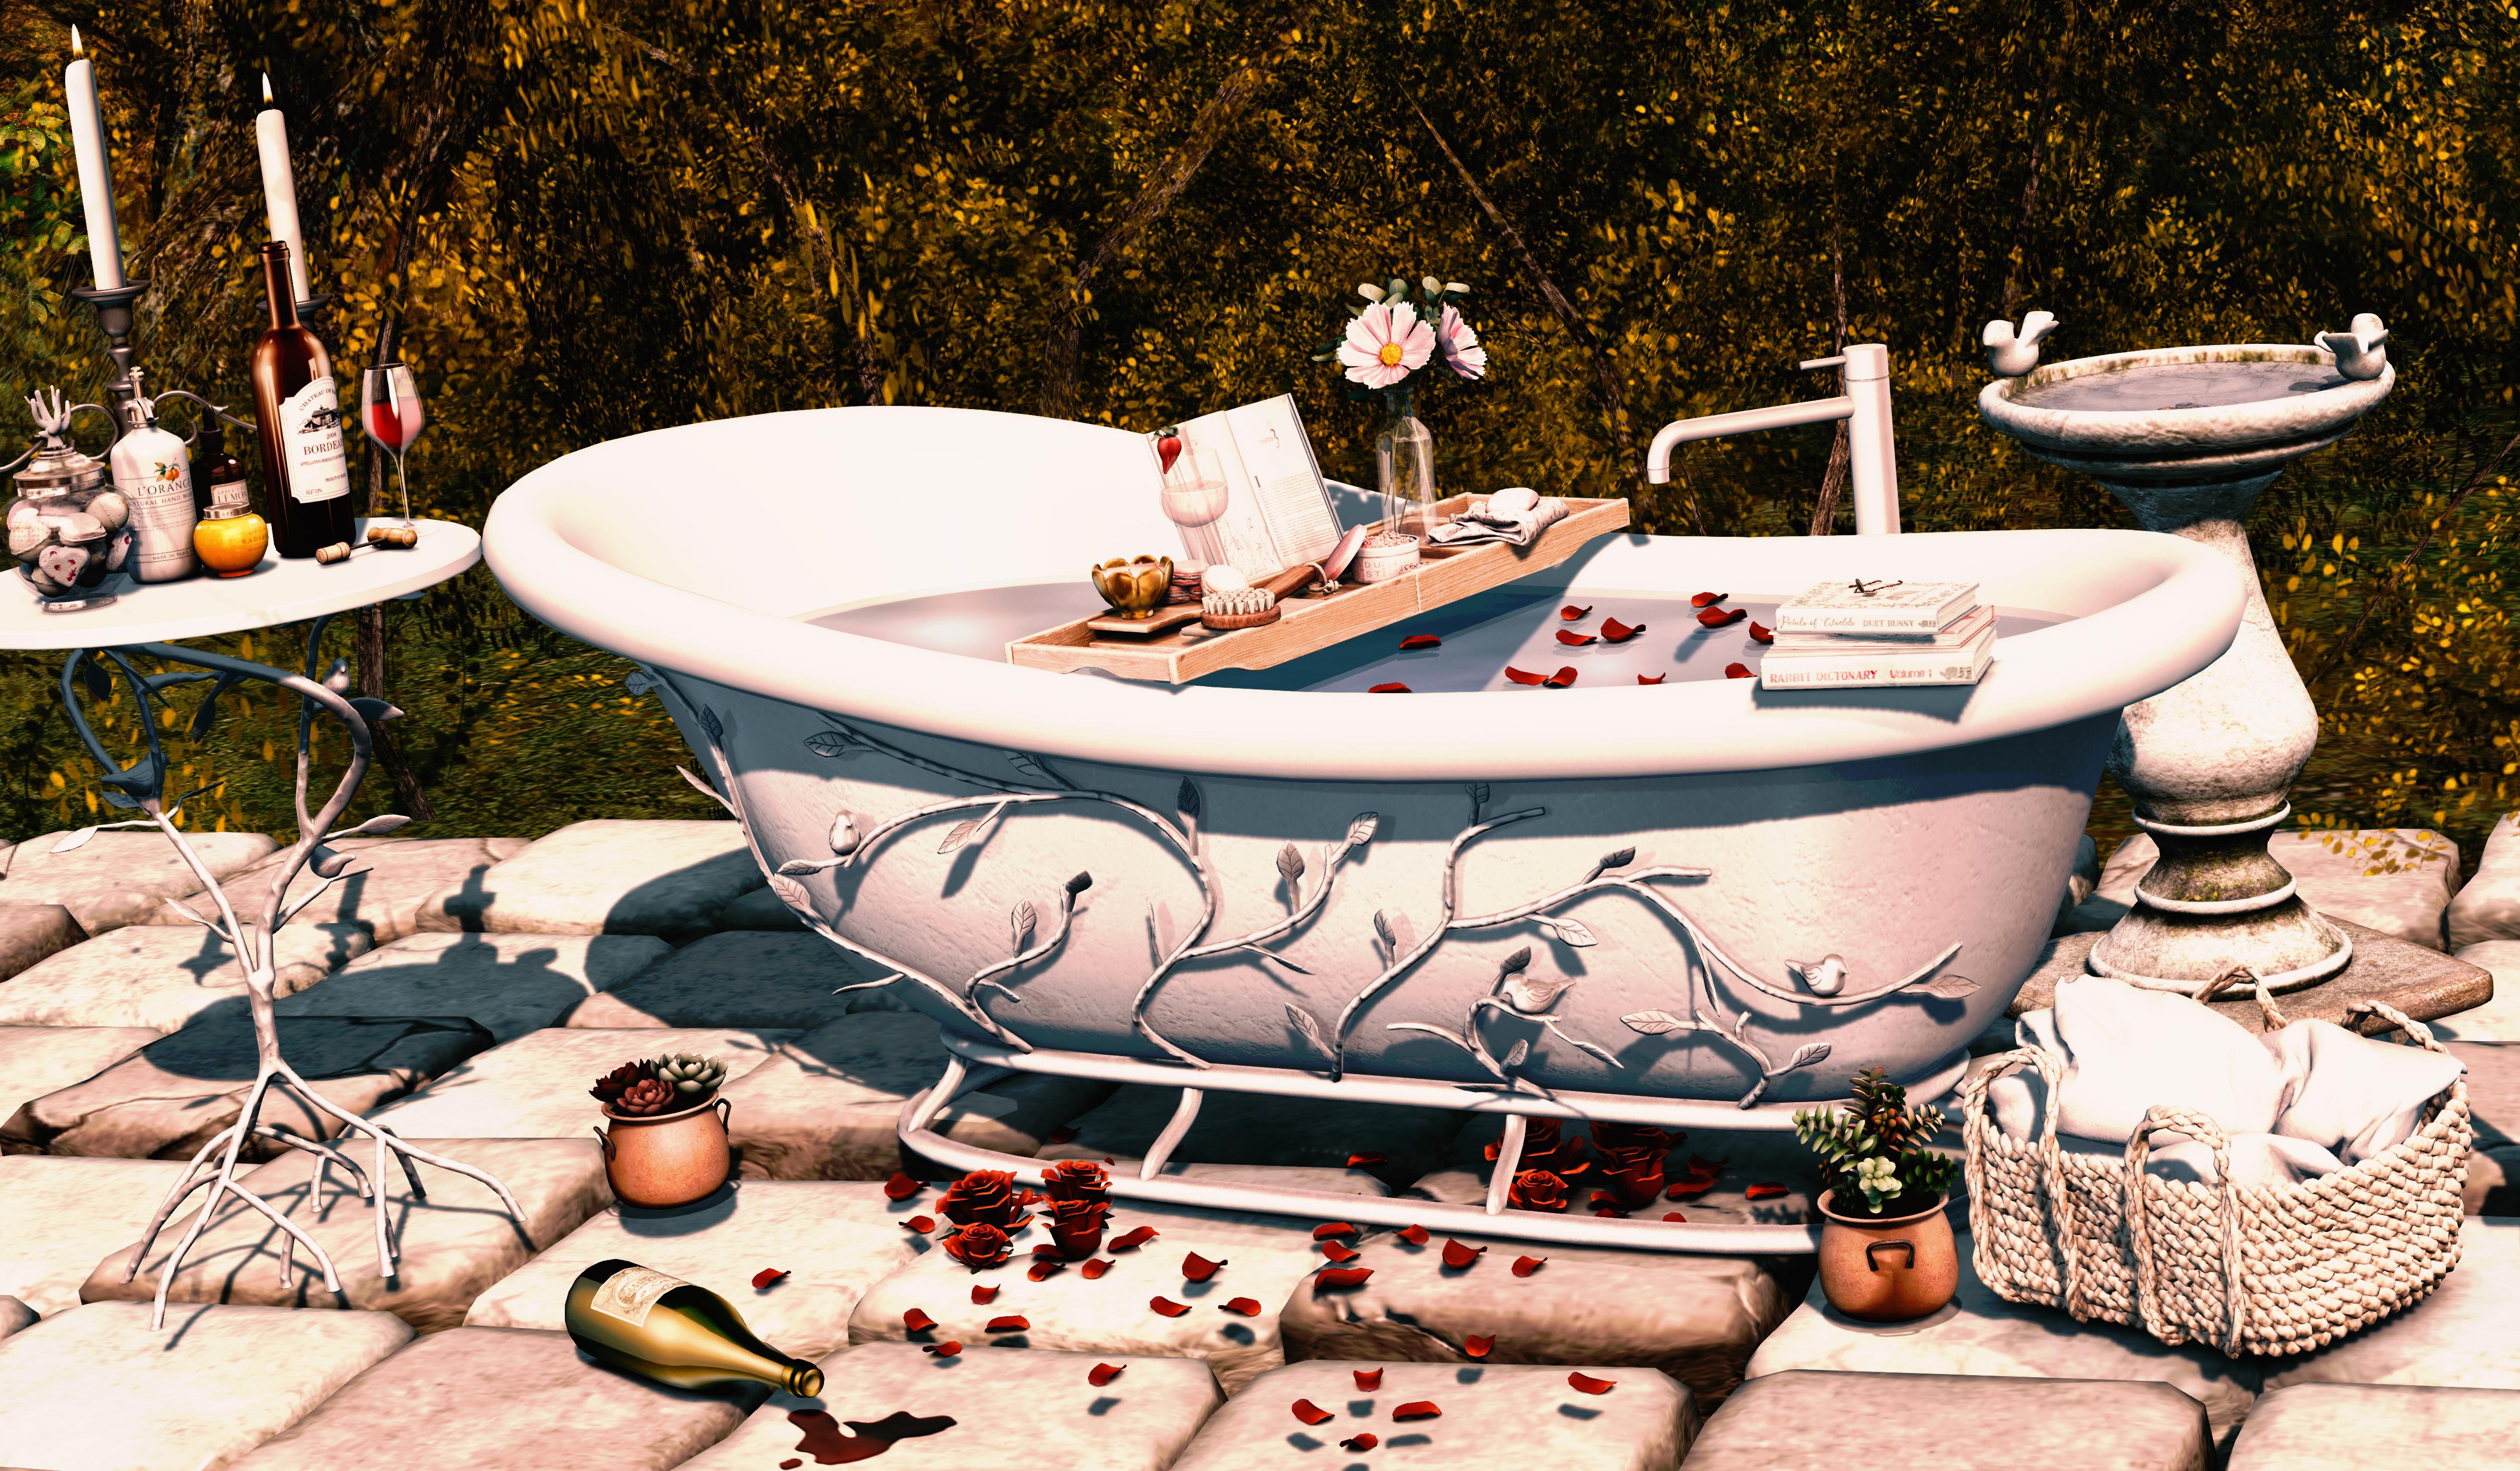 moss & mink bathtub